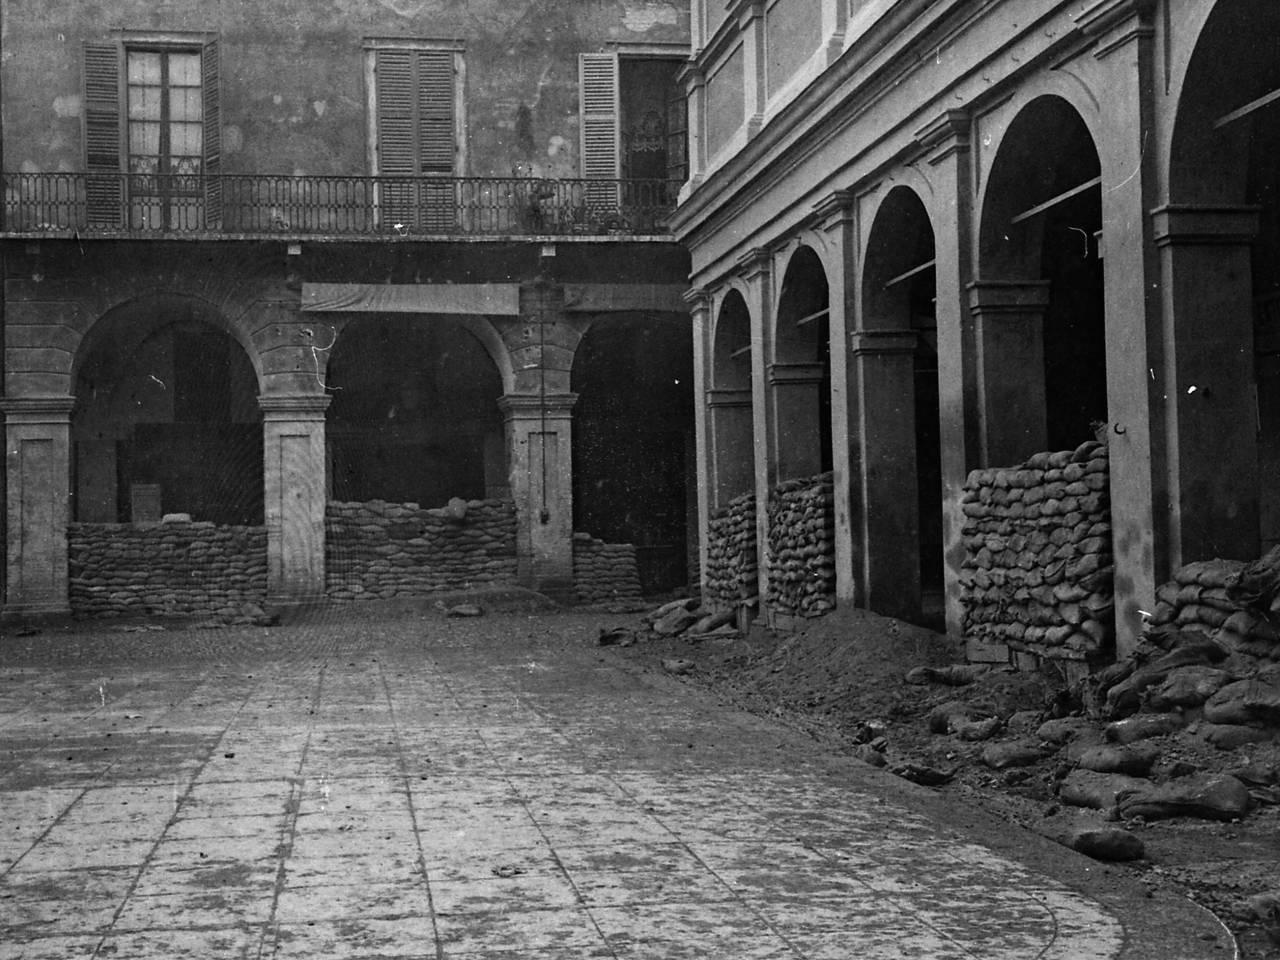 piazza san prospero con i sacchi di sabbia per la difesa antiaerea fototeca biblioteca panizzi, foto roberto sevardi - reggio emilia 1918